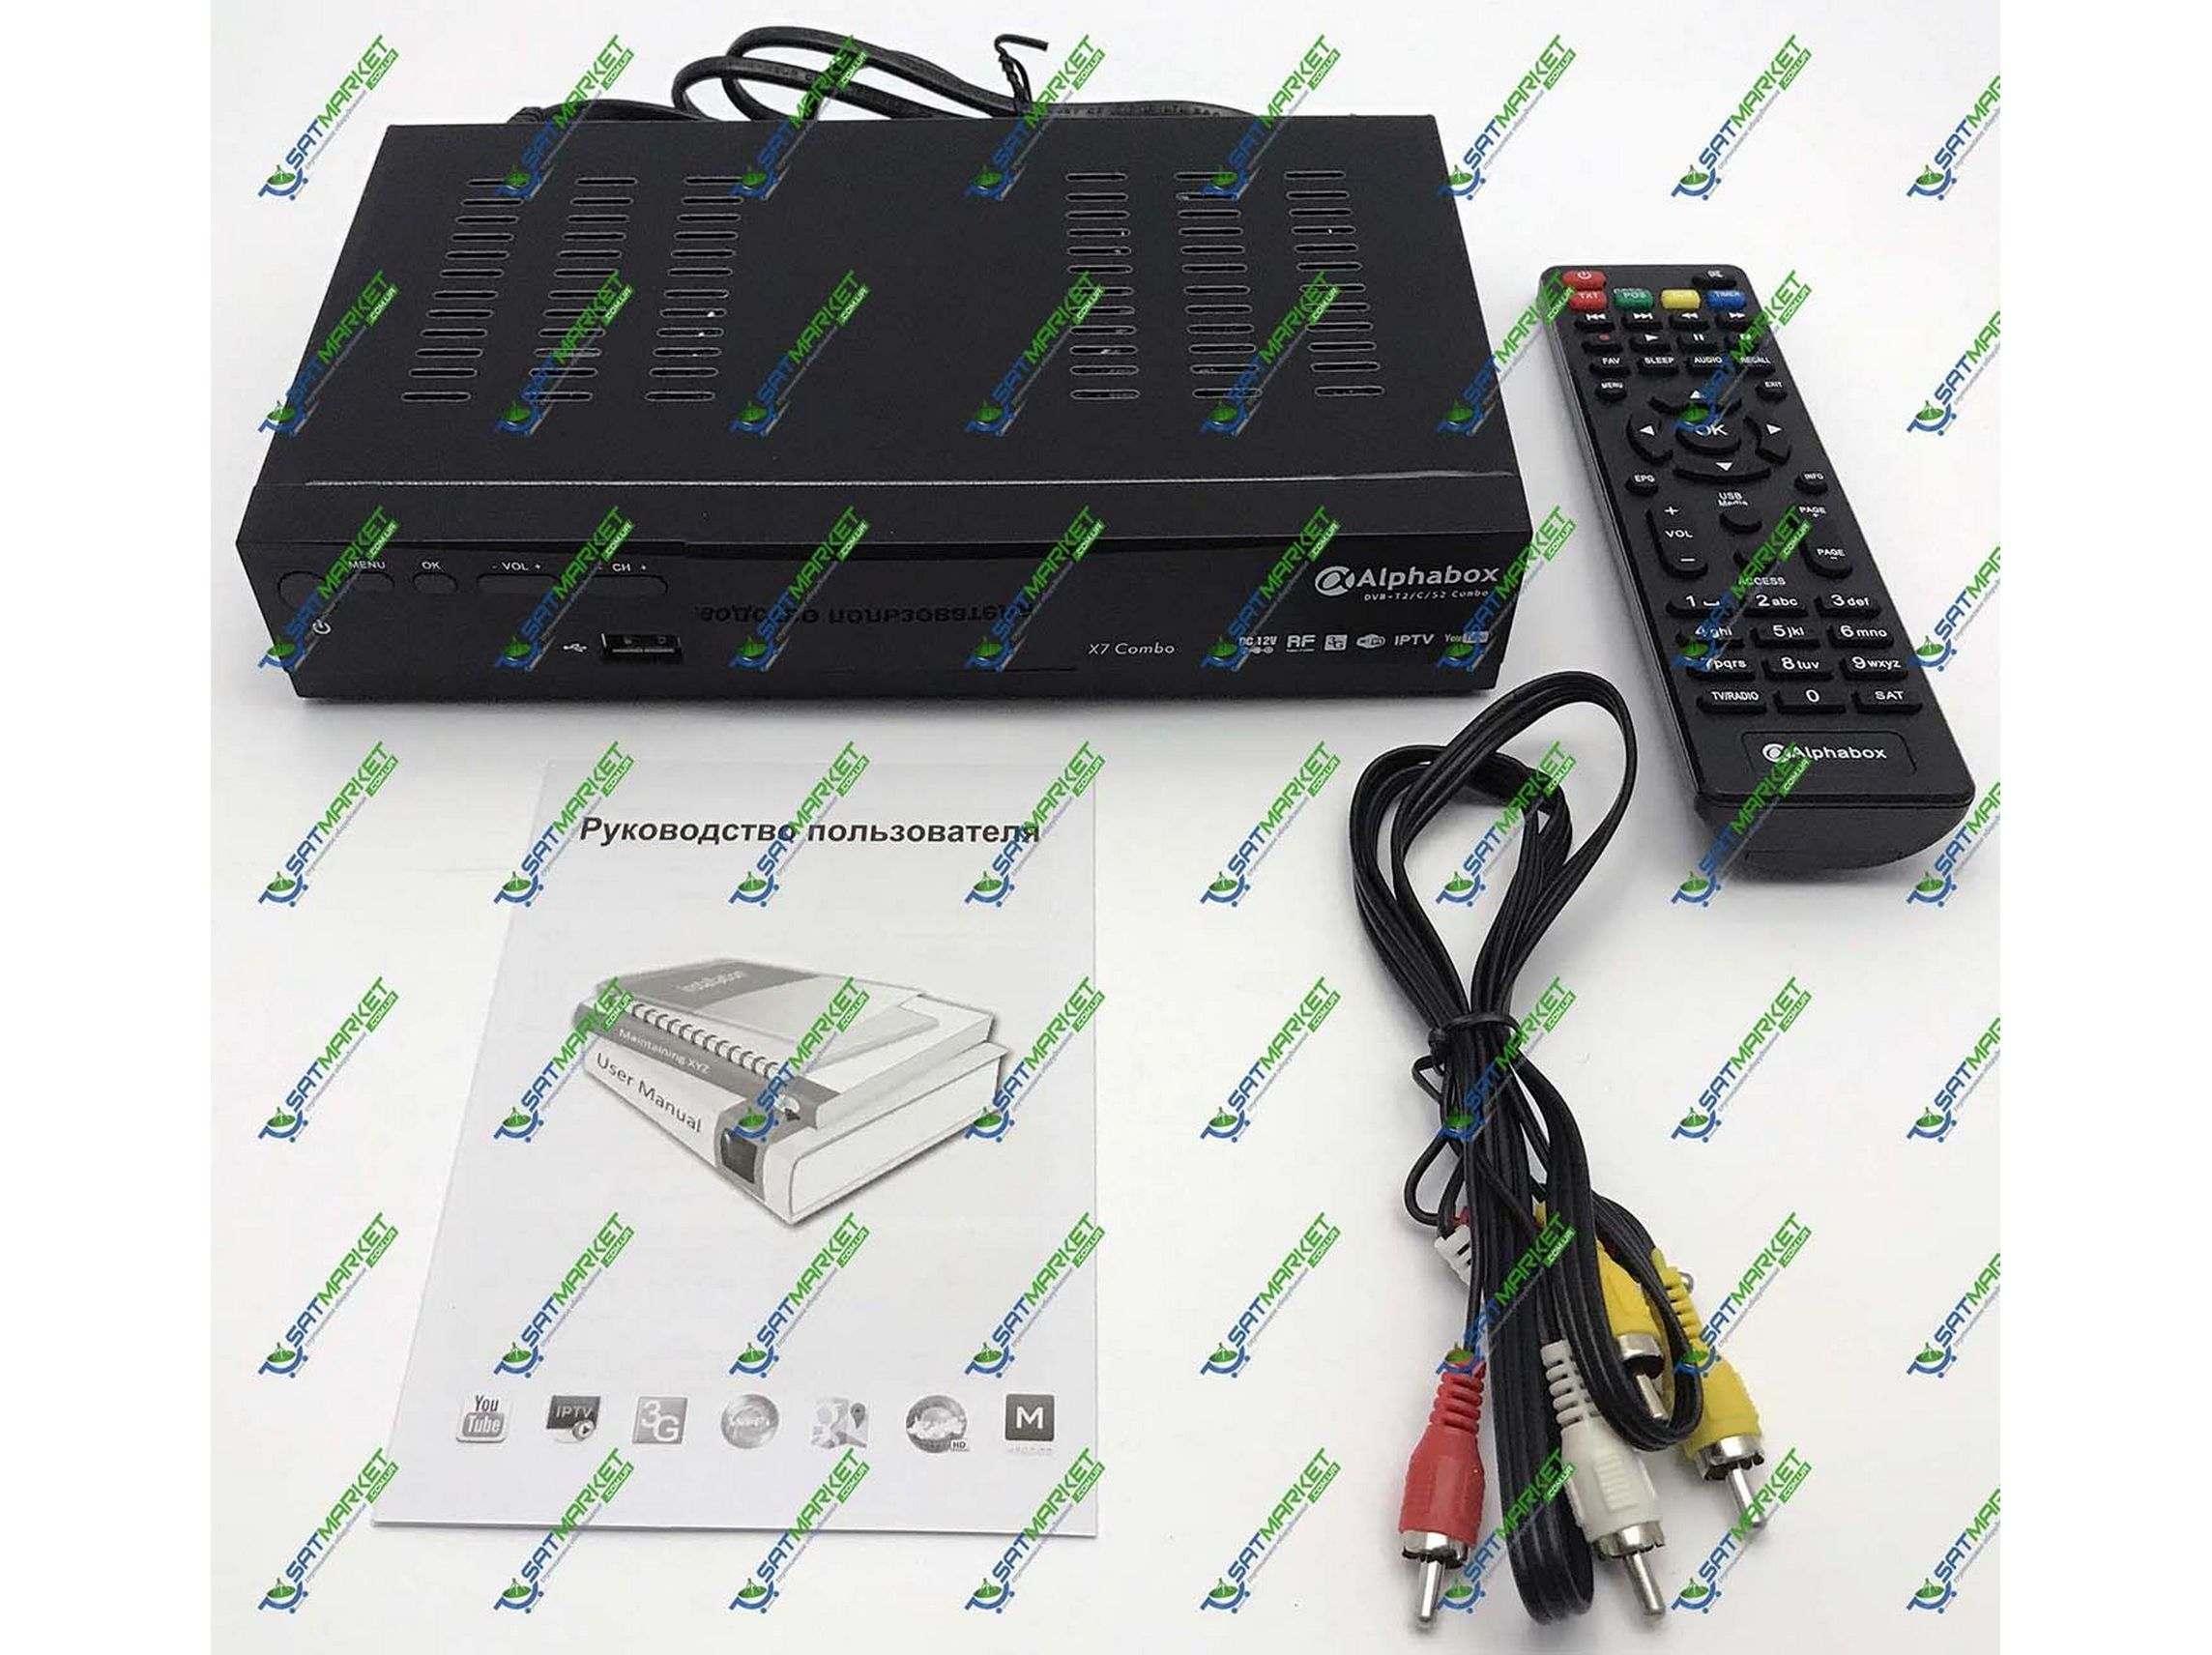 Купить Alphabox X7 Combo  Цена на Alphabox X7 Combo в Киеве